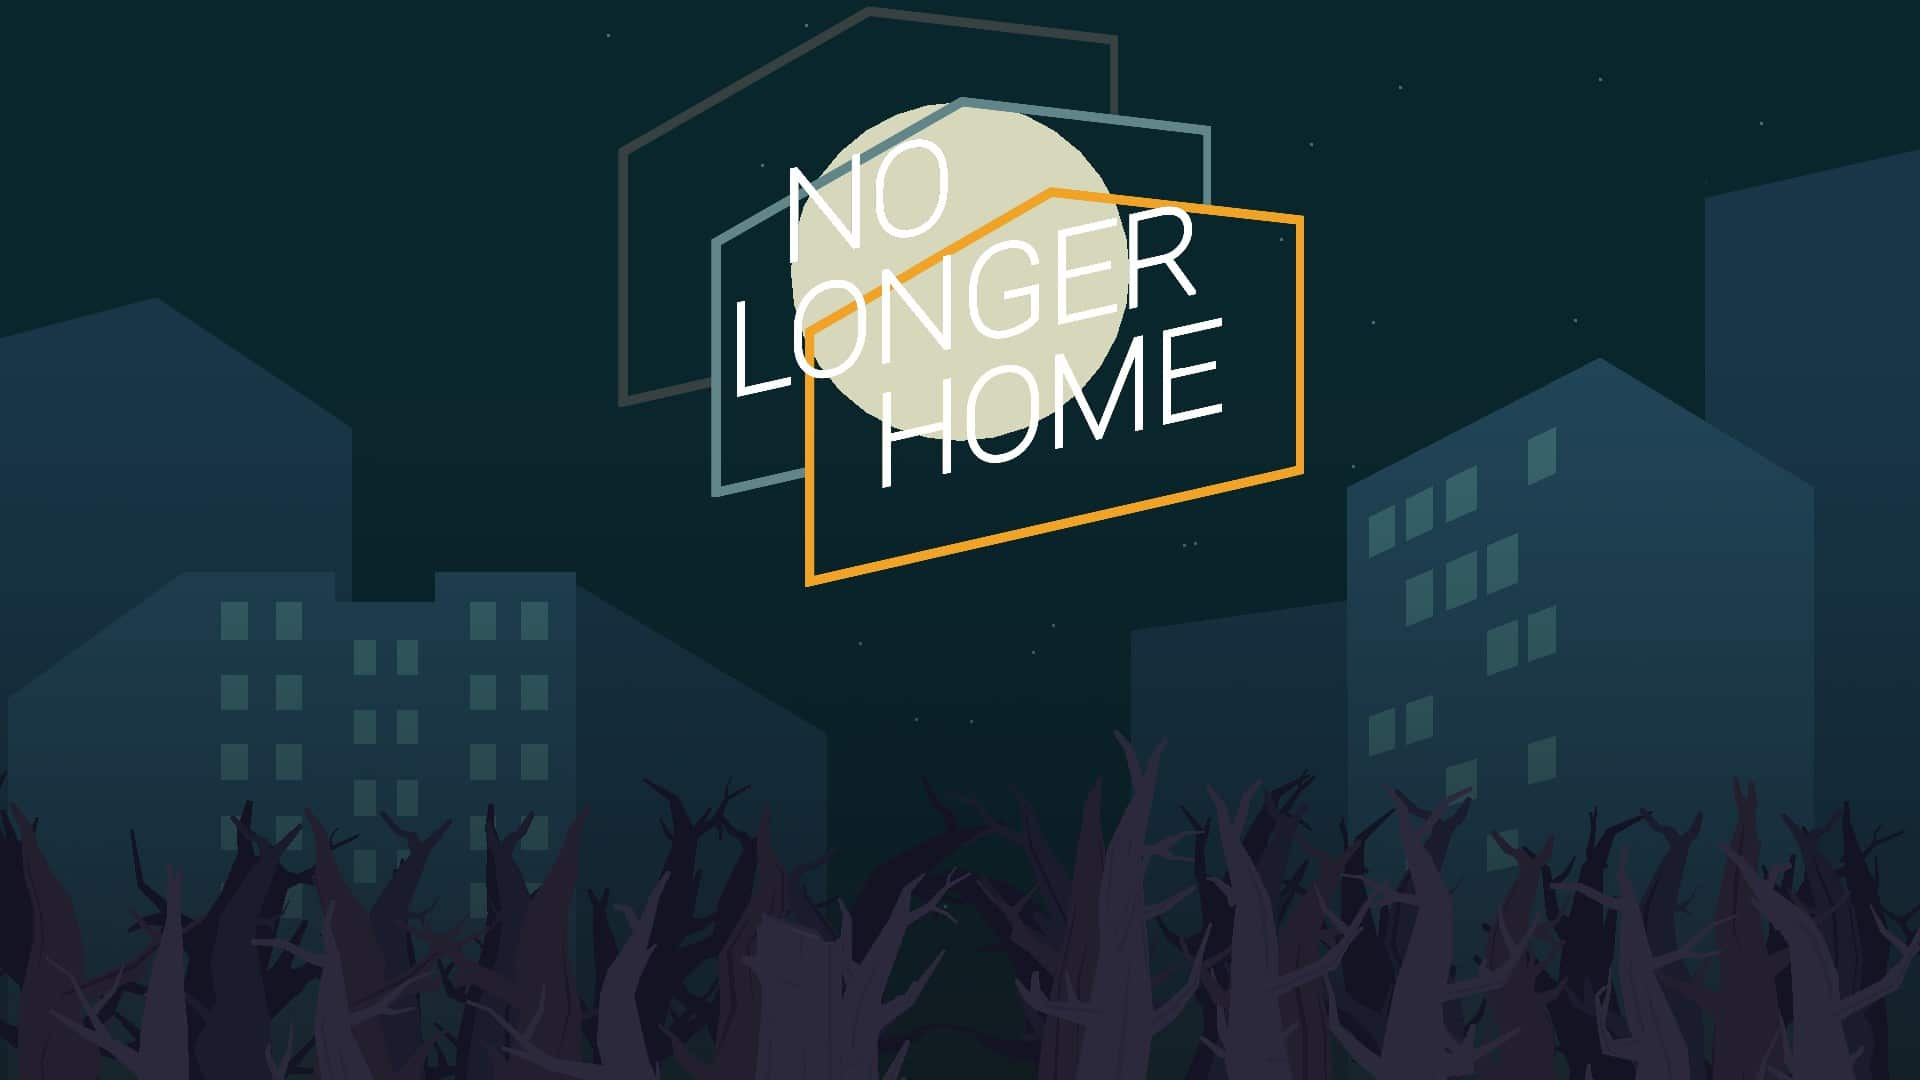 No Longer Home - Feature Image